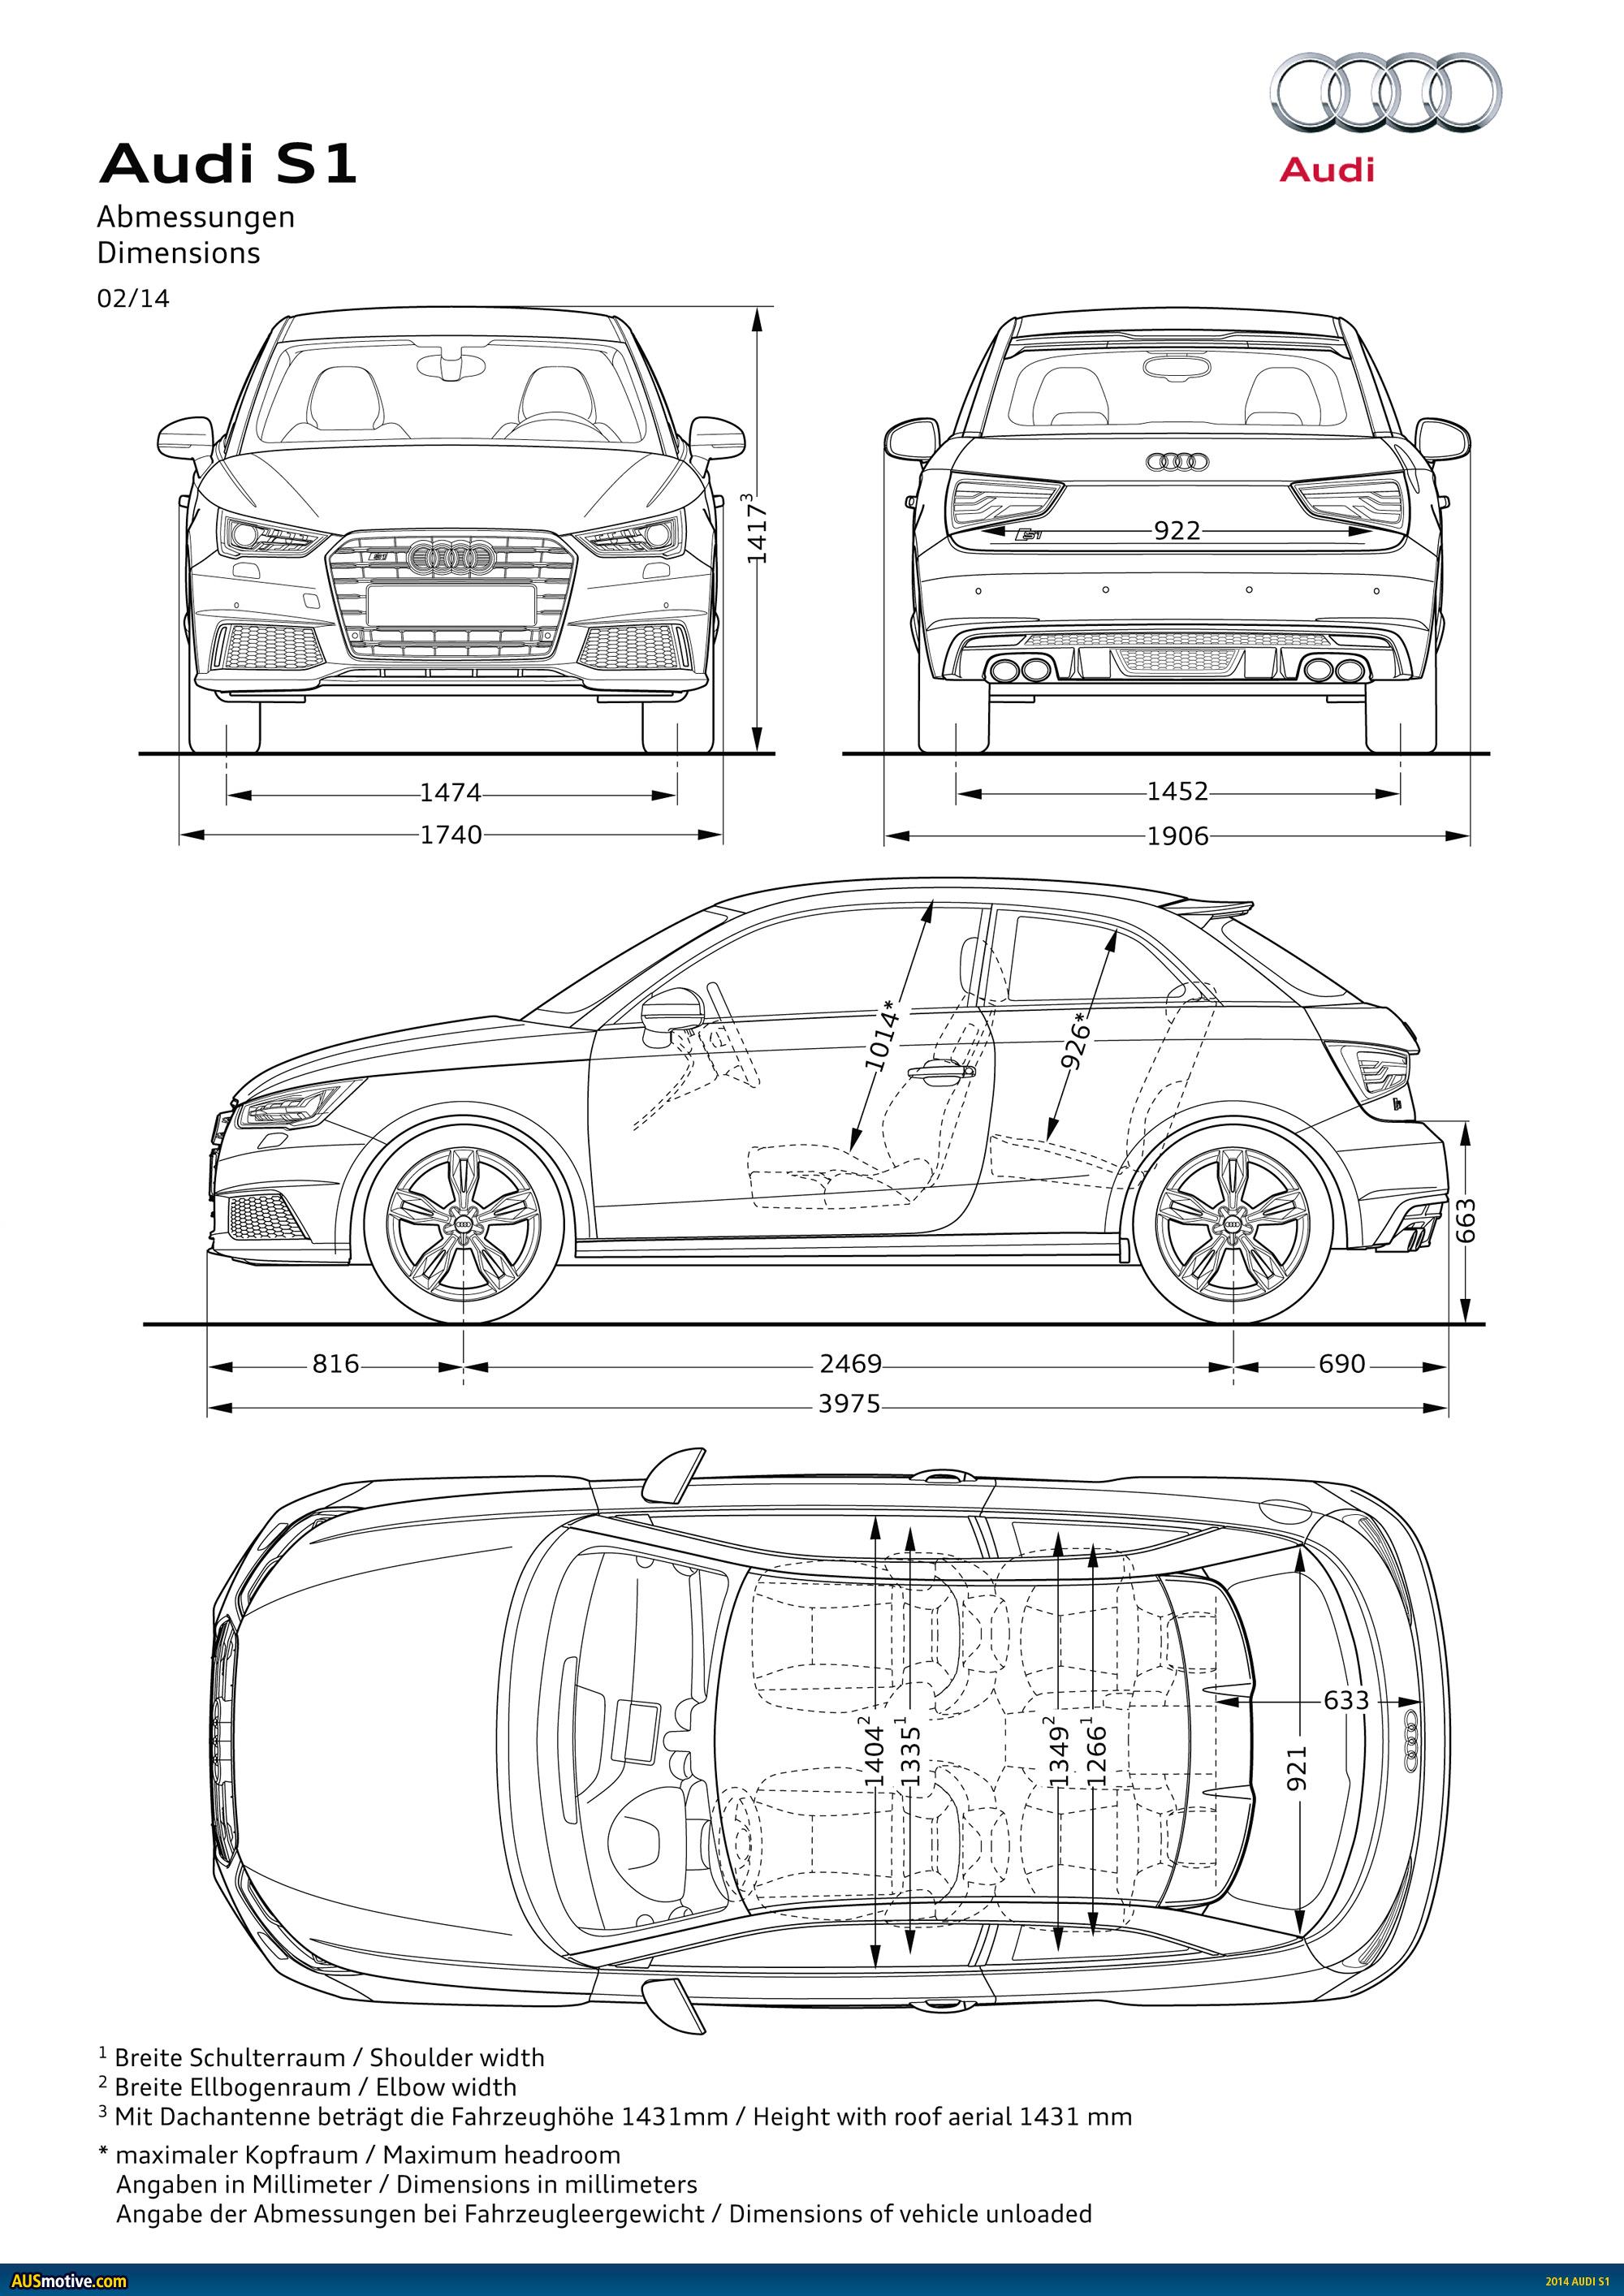 Ausmotive Audi S1 Amp S1 Sportback Revealed